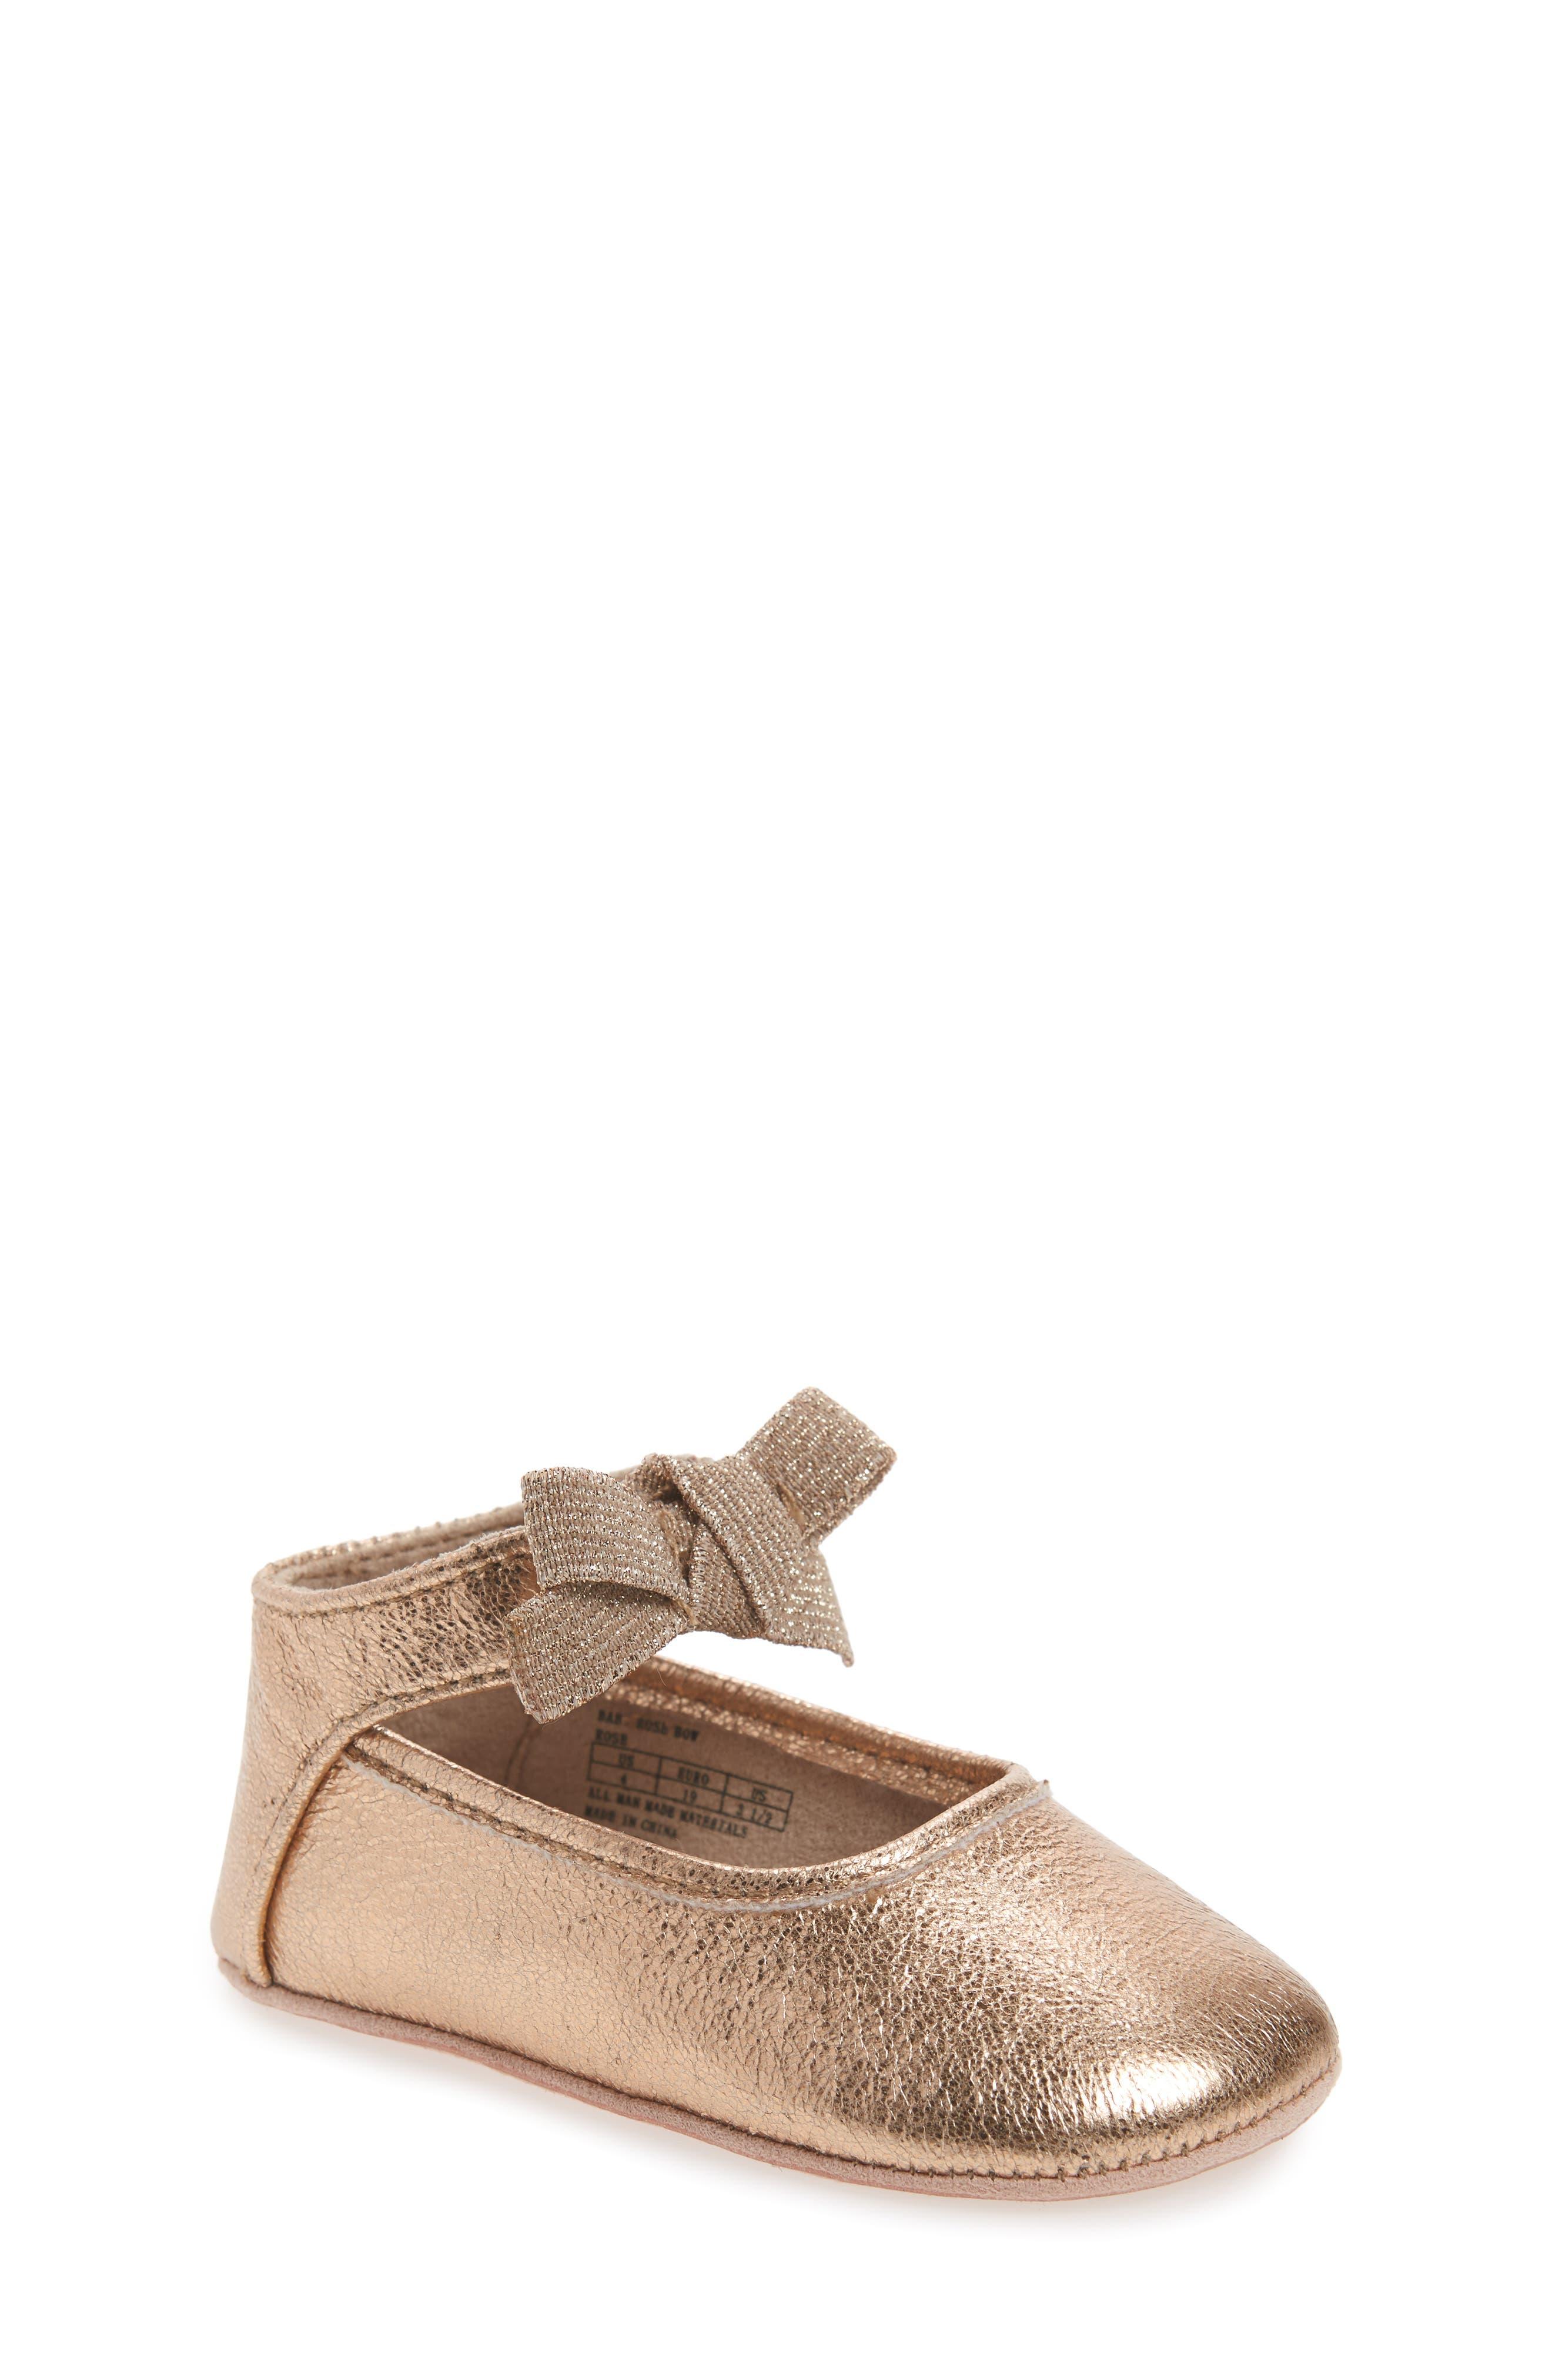 Rose Bow Metallic Ballet Flat,                         Main,                         color, ROSE